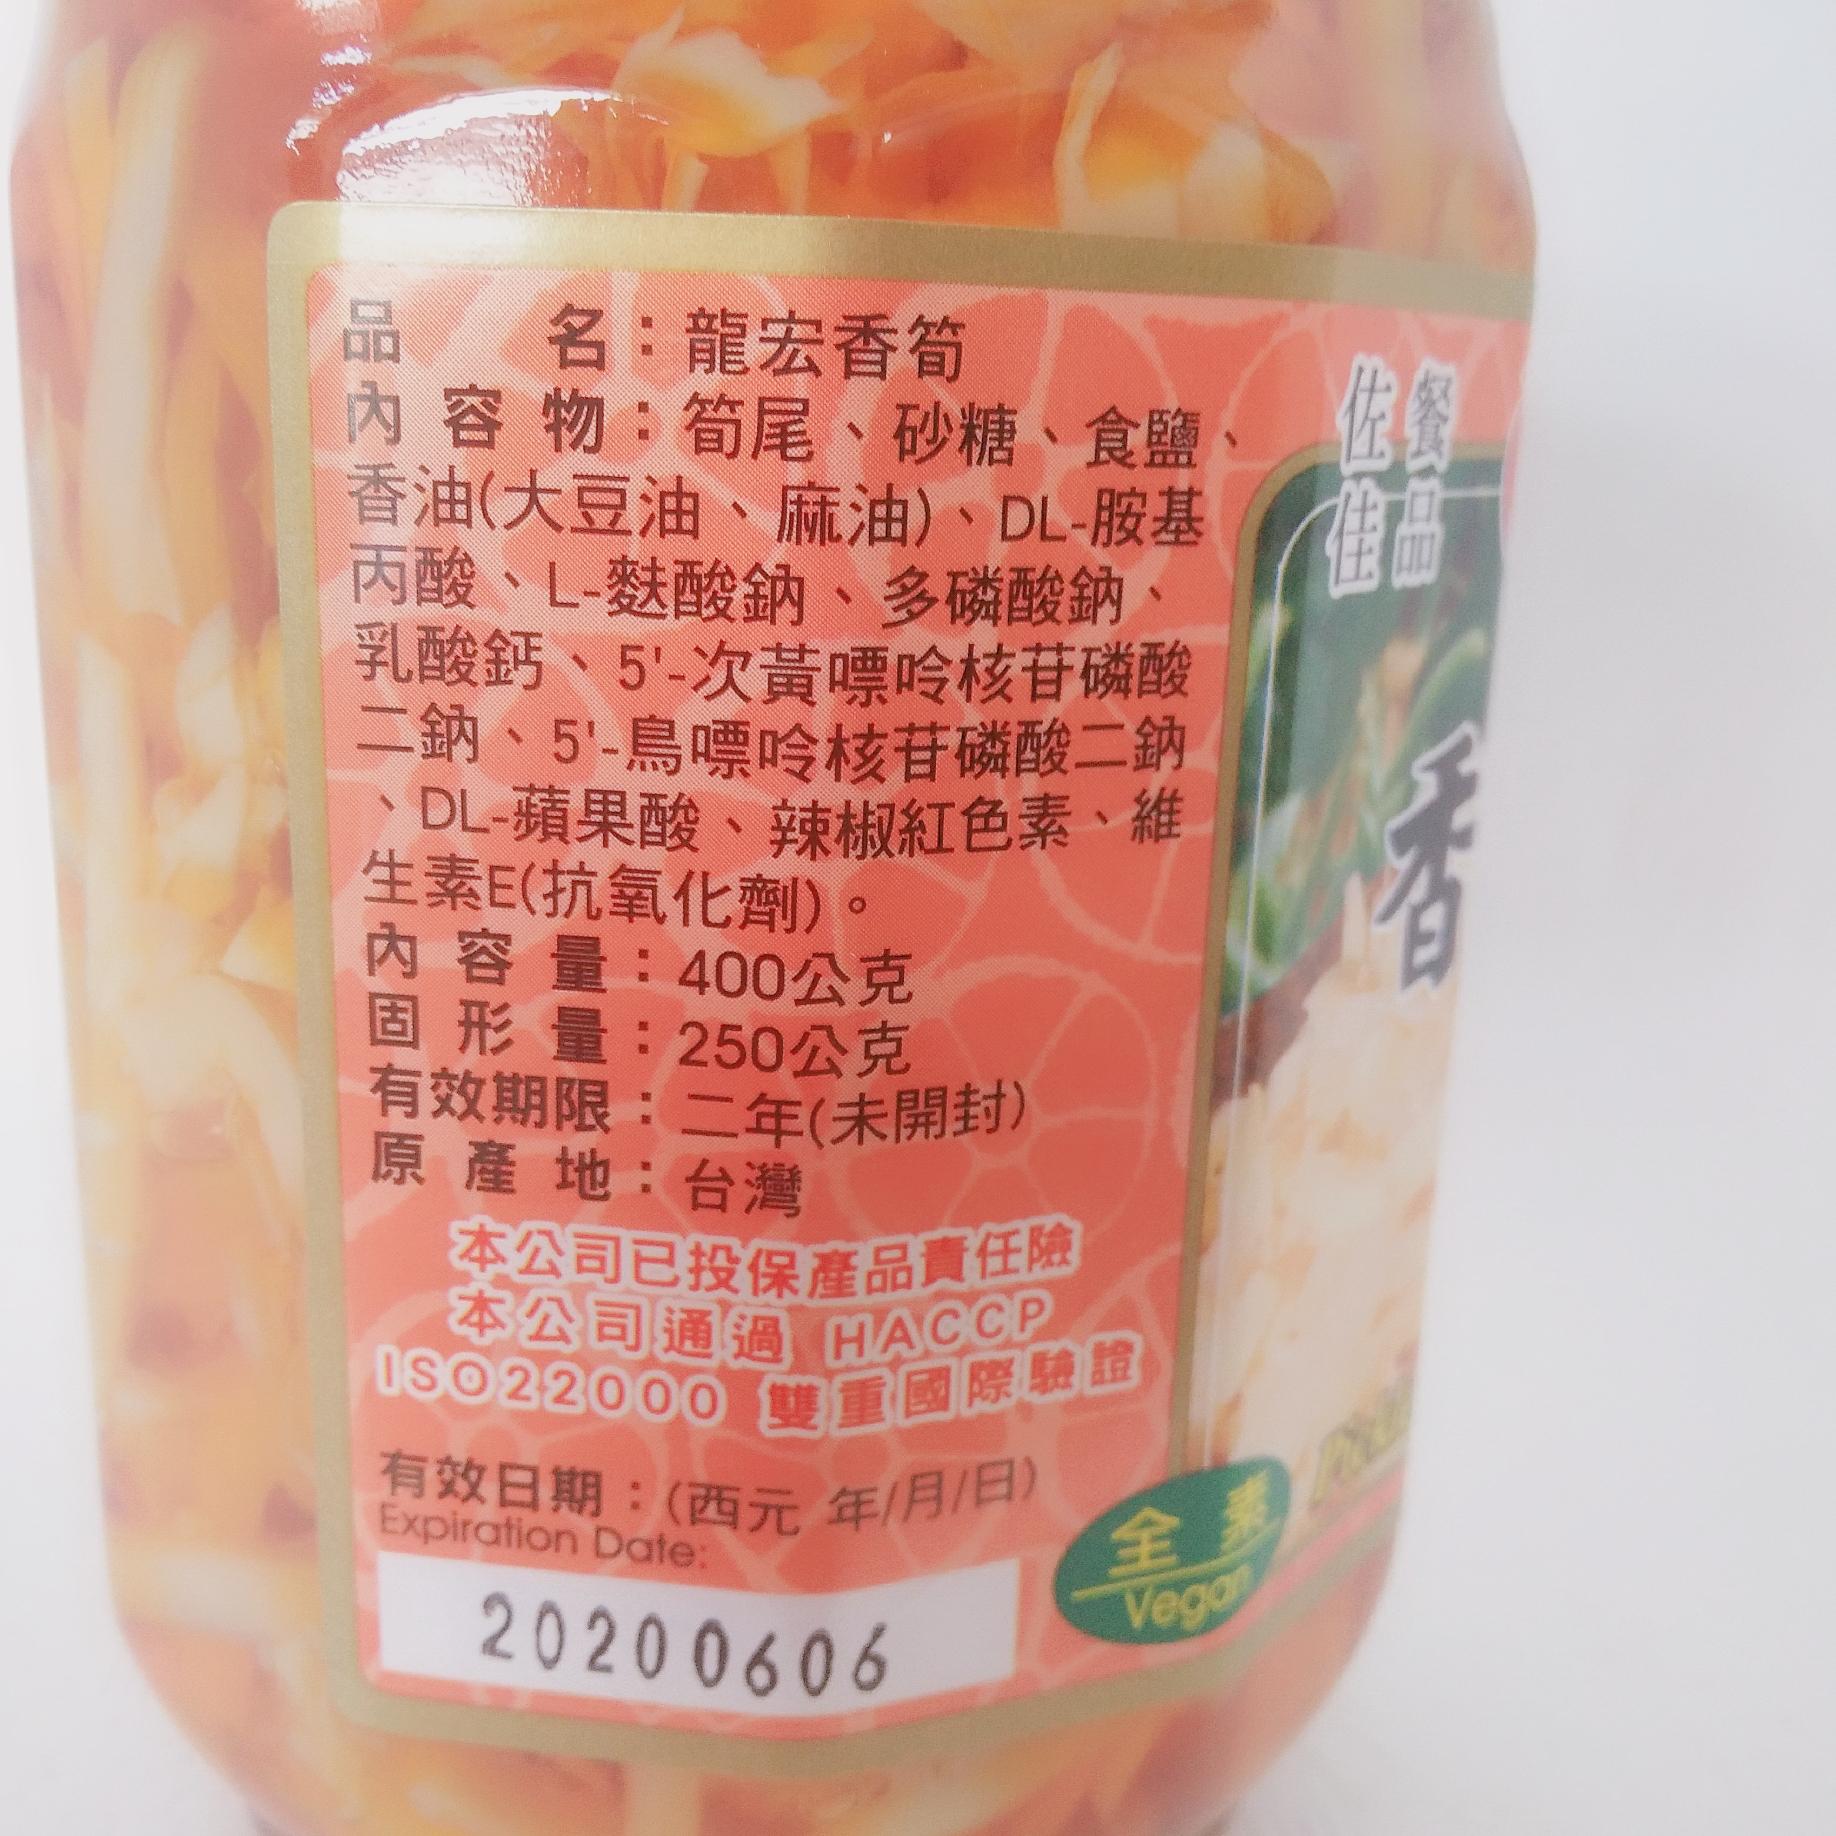 Image LH Bamboo Shoots 龍宏 - 香筍 400grams